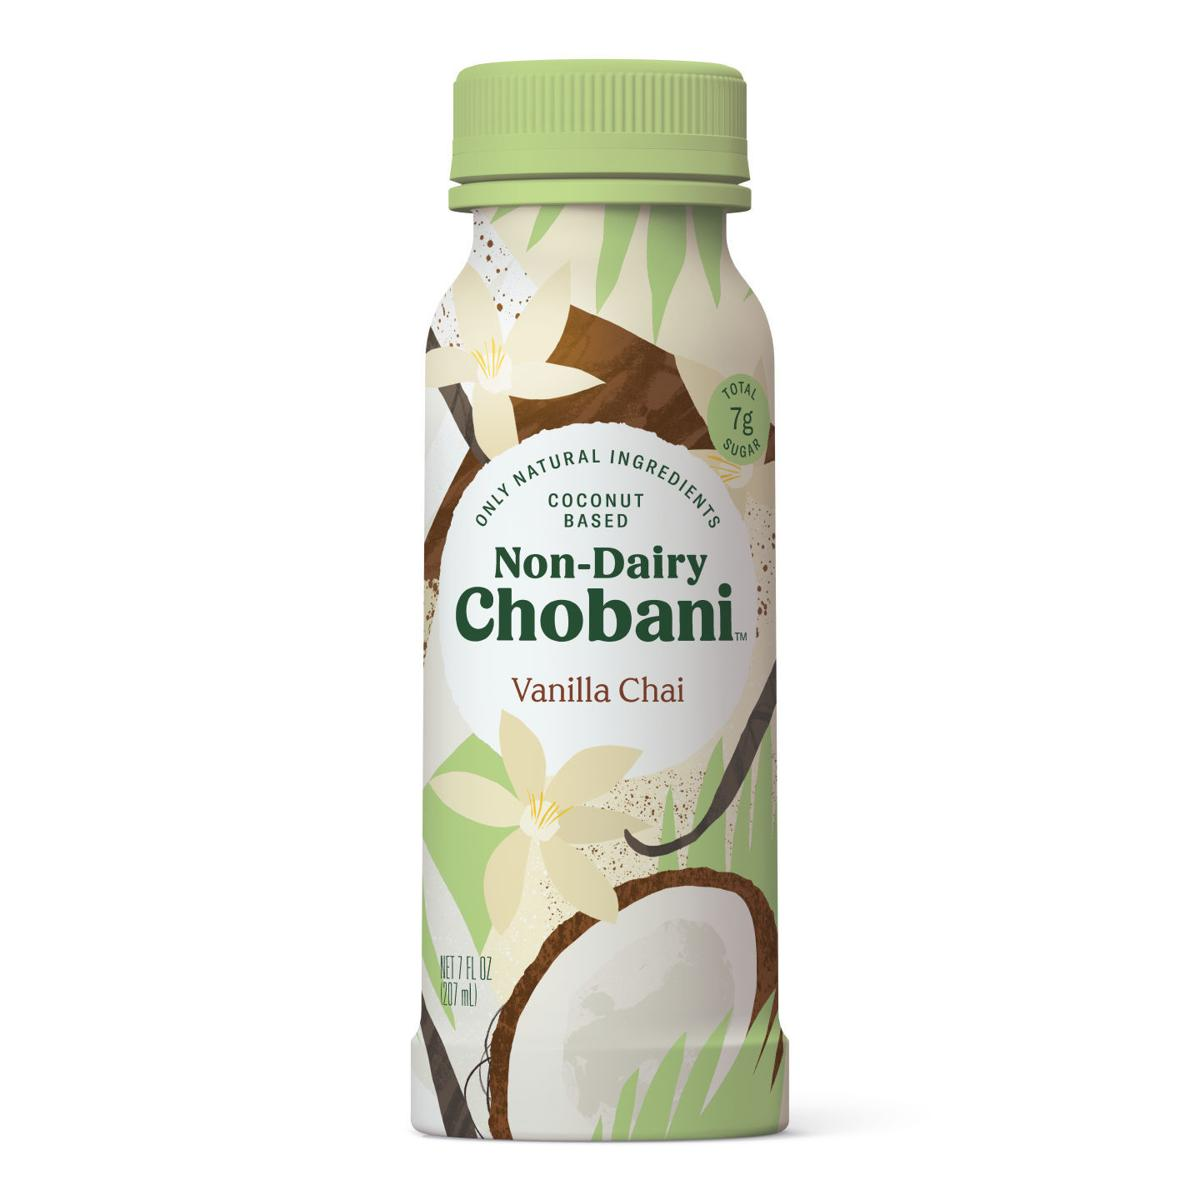 Non-Dairy Chobani drink vanilla chai